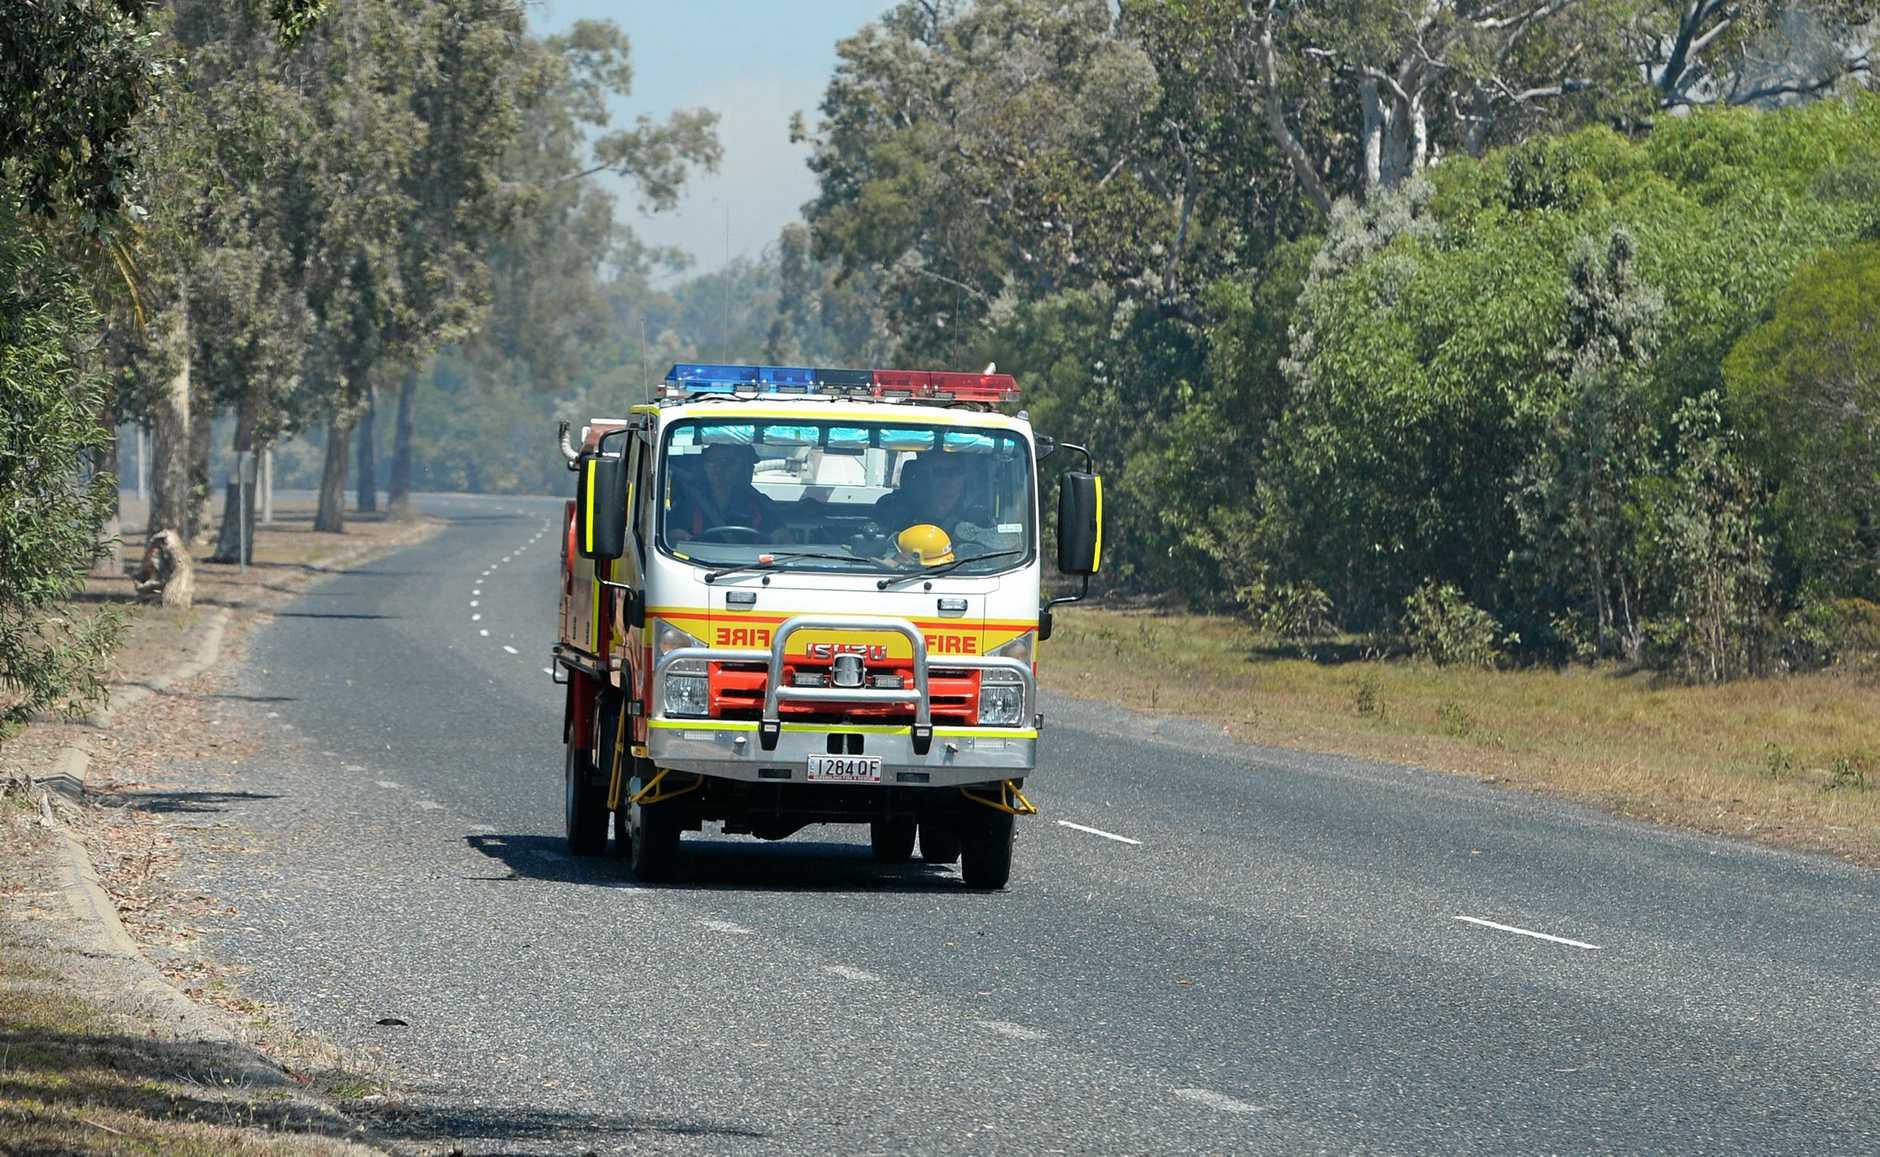 FIRE: Crews are fighting a fire in Farnborough